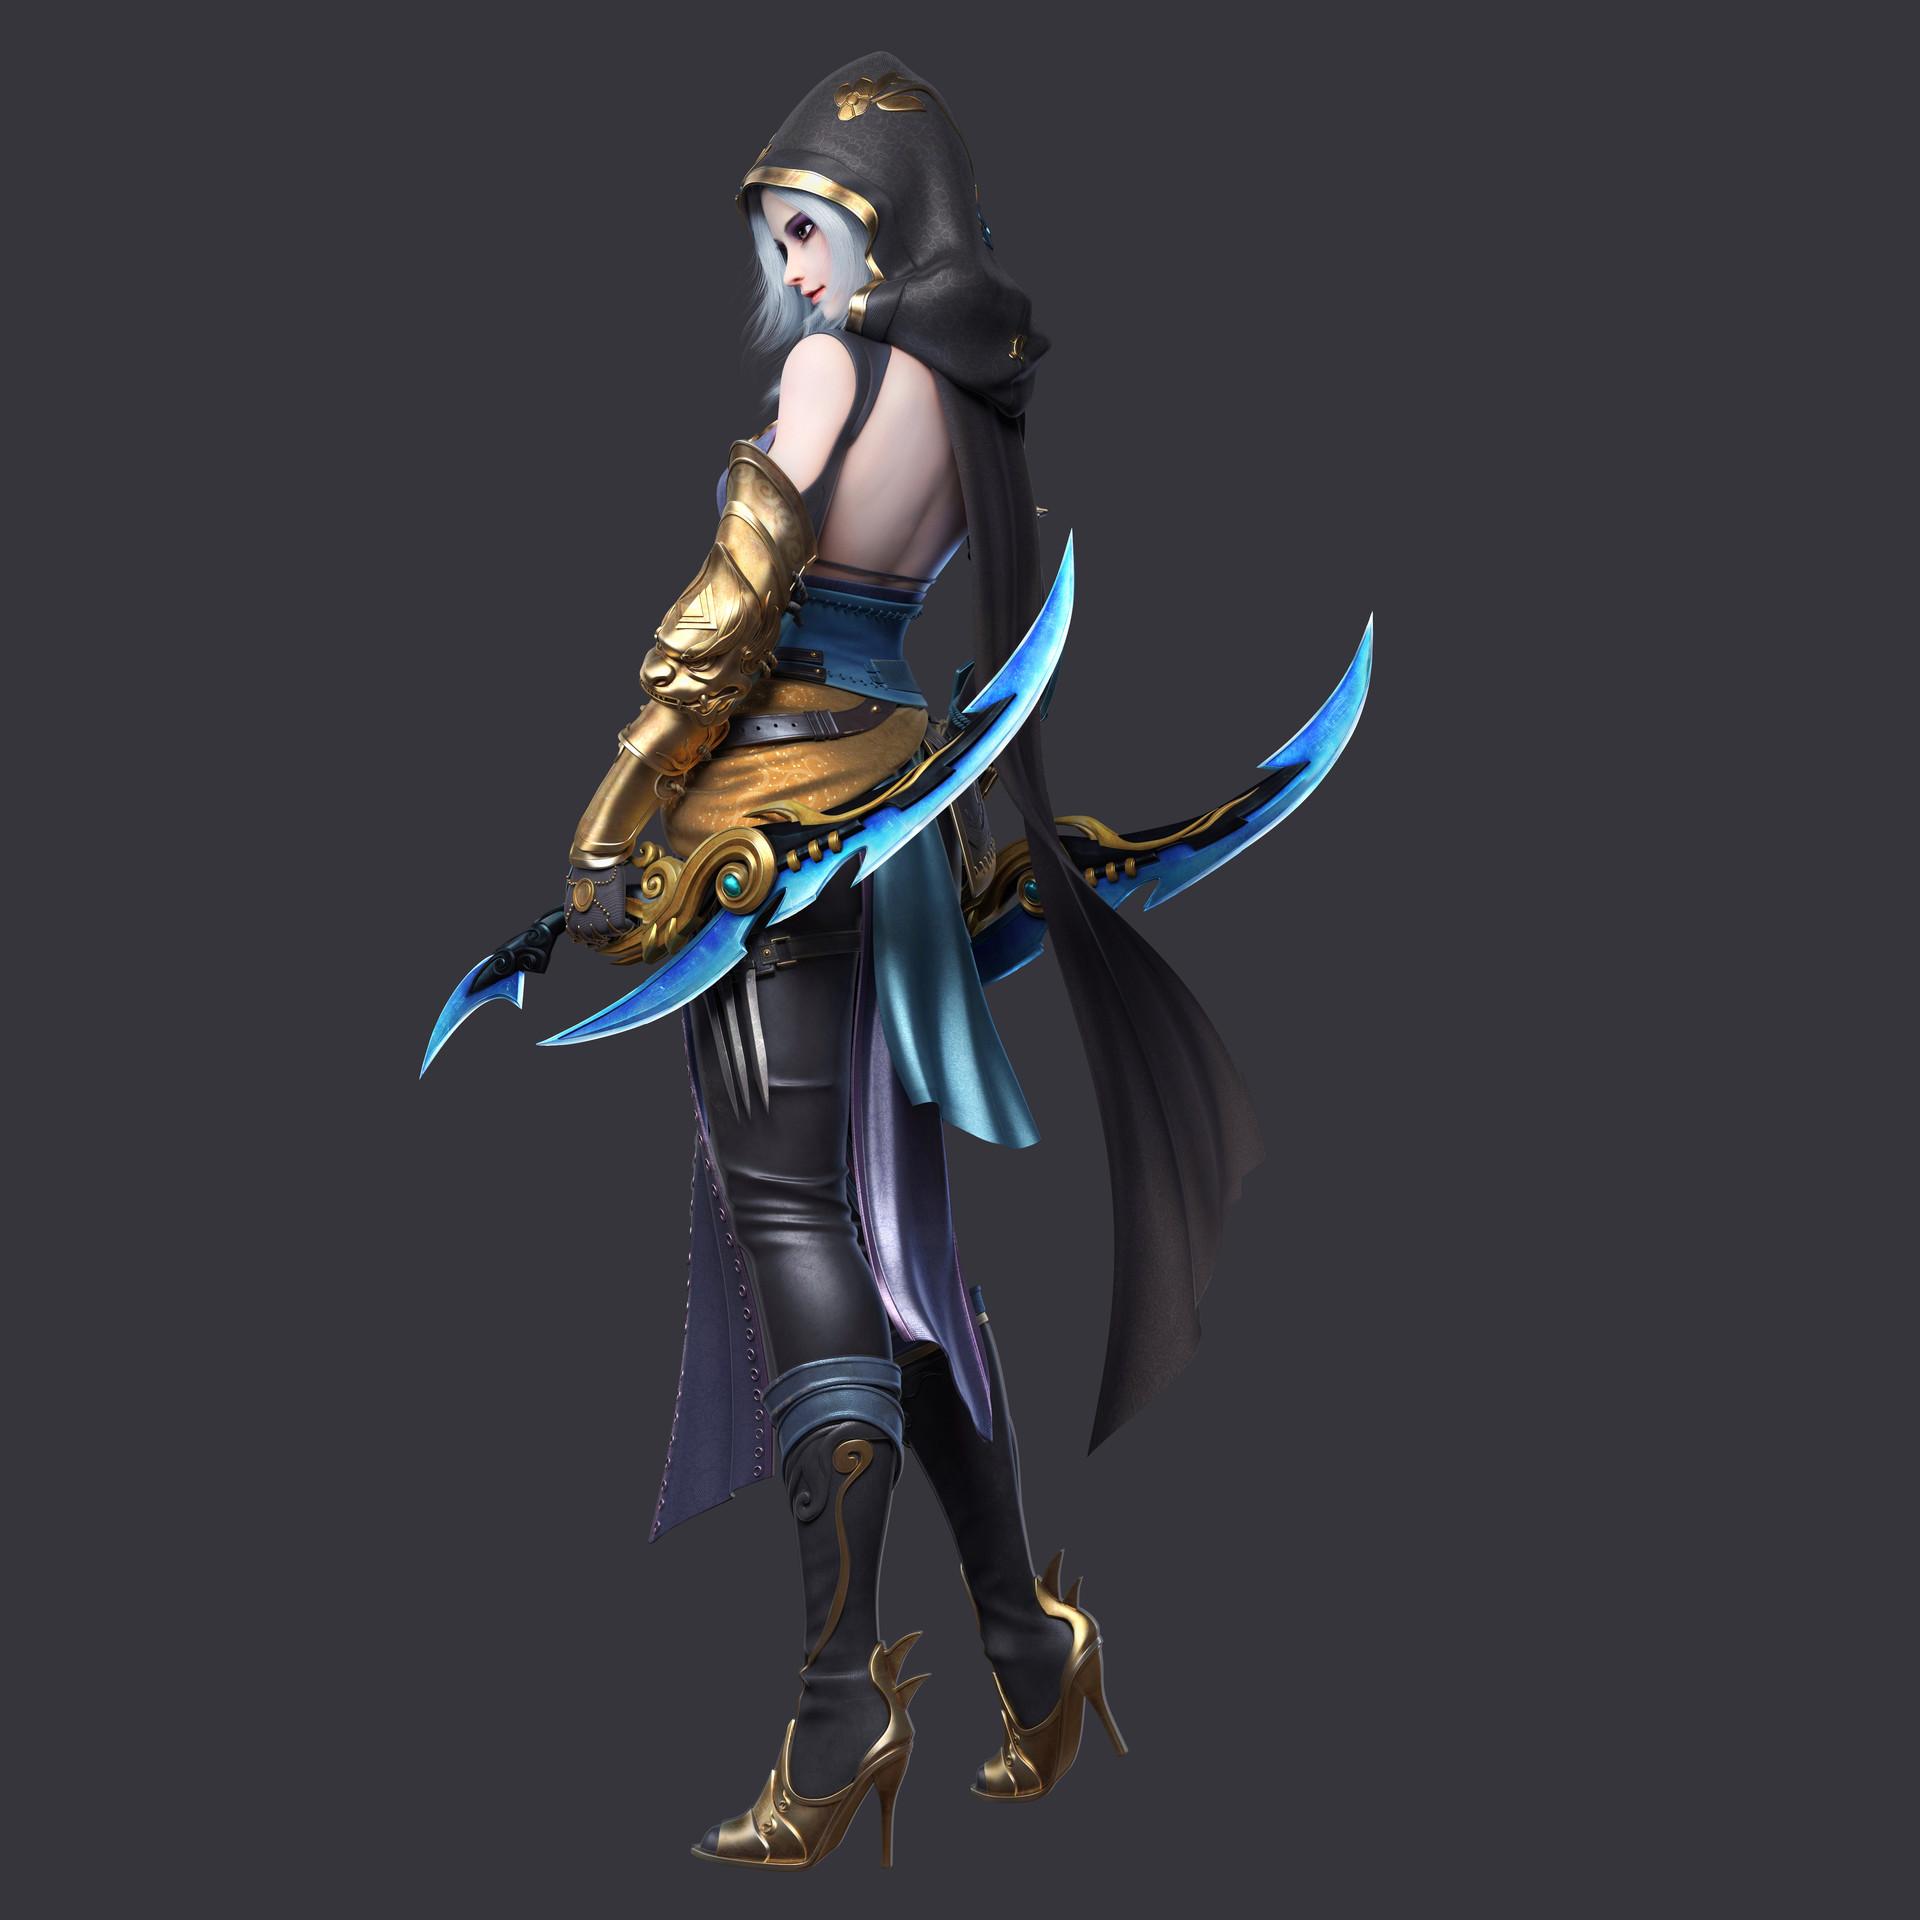 General 1920x1920 Yue Wang CGI hoods weapon blades women silver hair high heels armor warrior